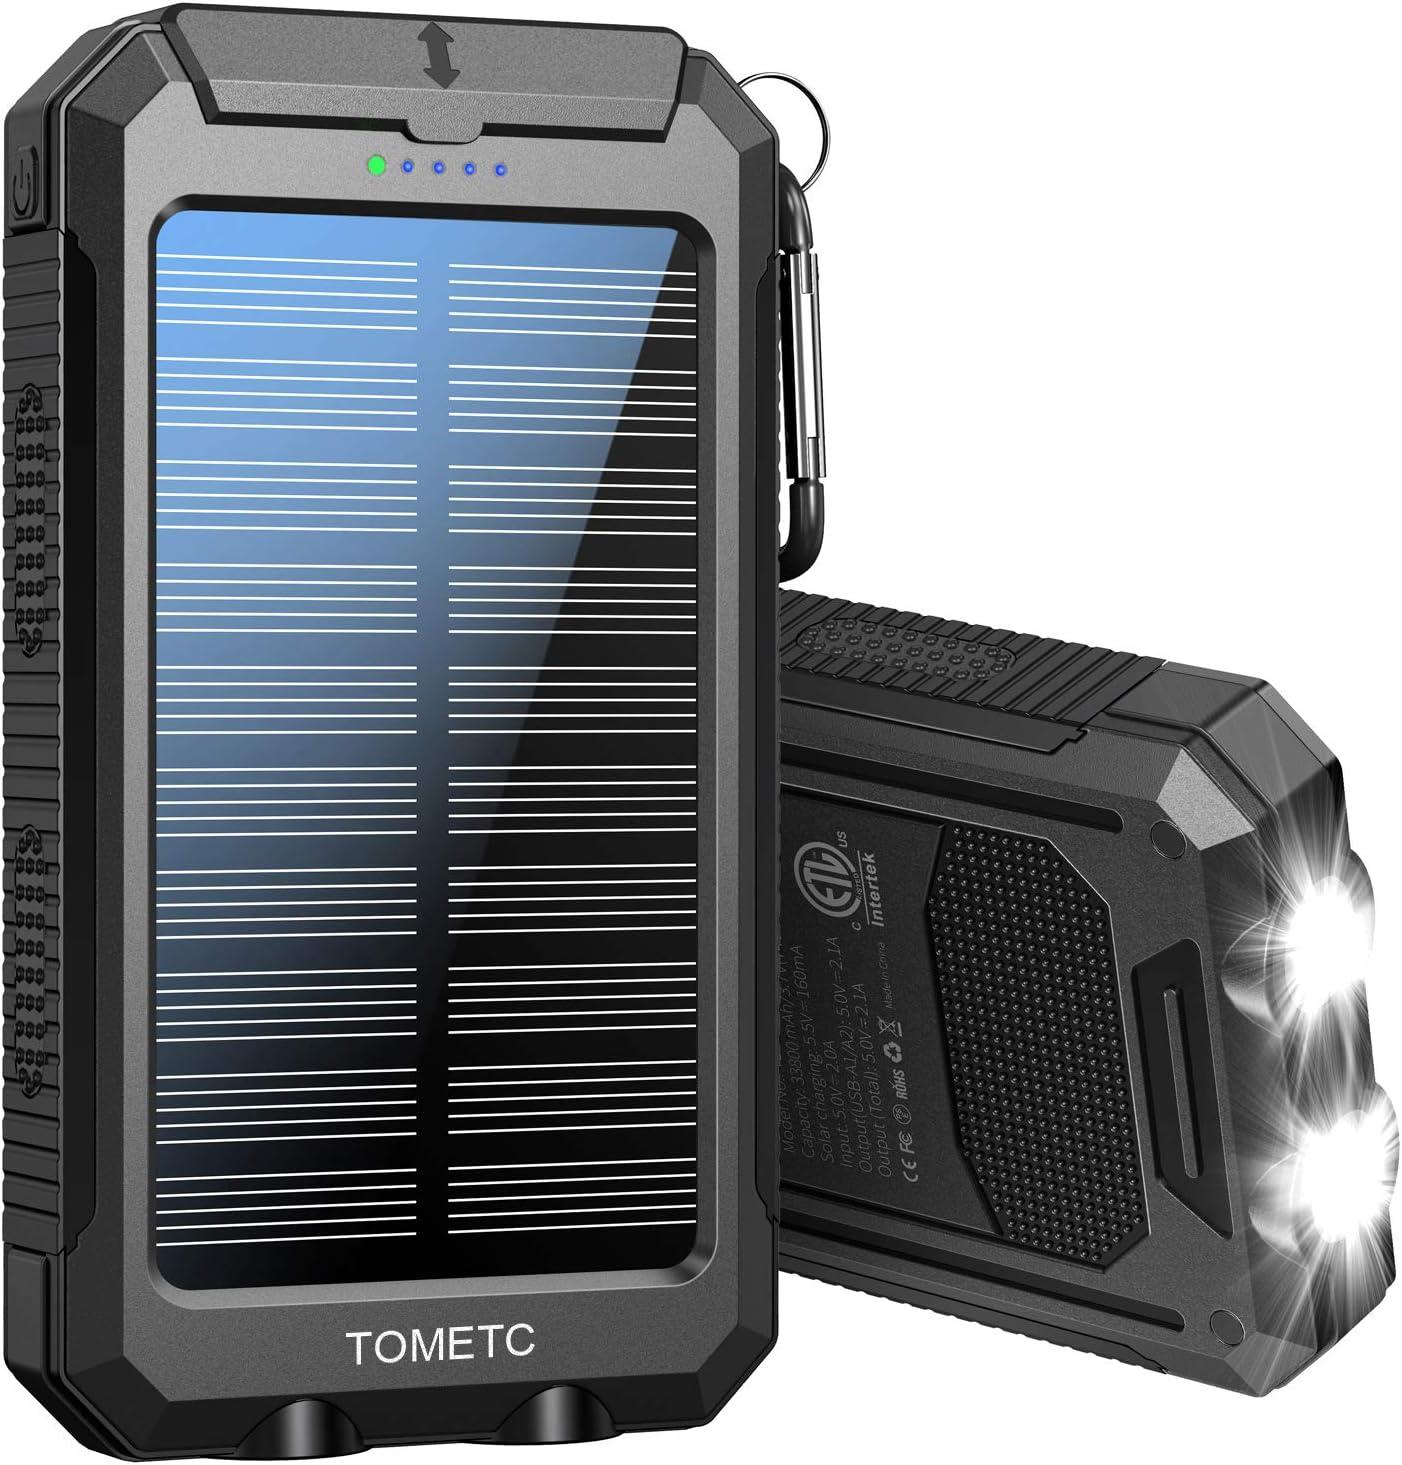 TOMETC 33800mAh 5V3.1A,18W PD QC 3.0 Dual 2 USB Portable Solar Power Bank $27.98 Coupon